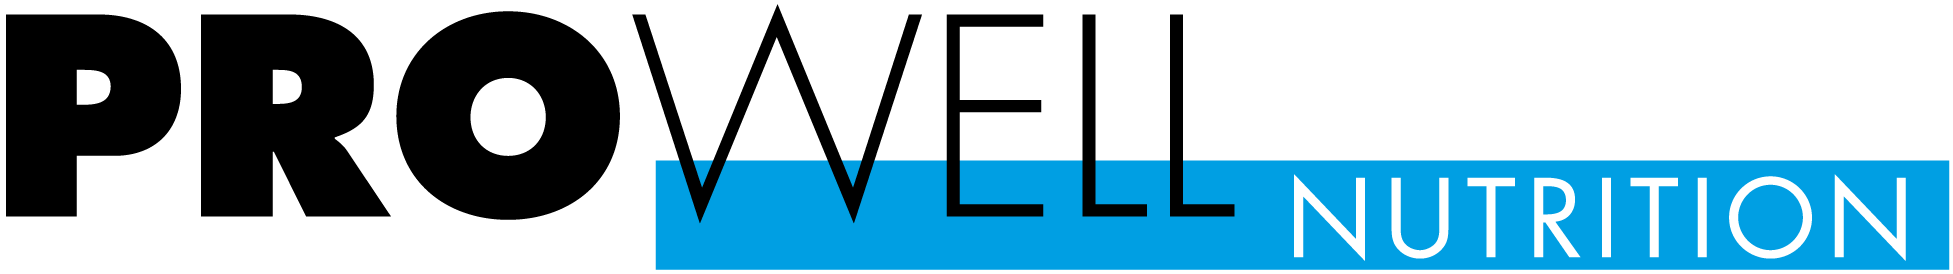 ProWell Lennik - Pro Well Nutrition - Voedingssupplementen